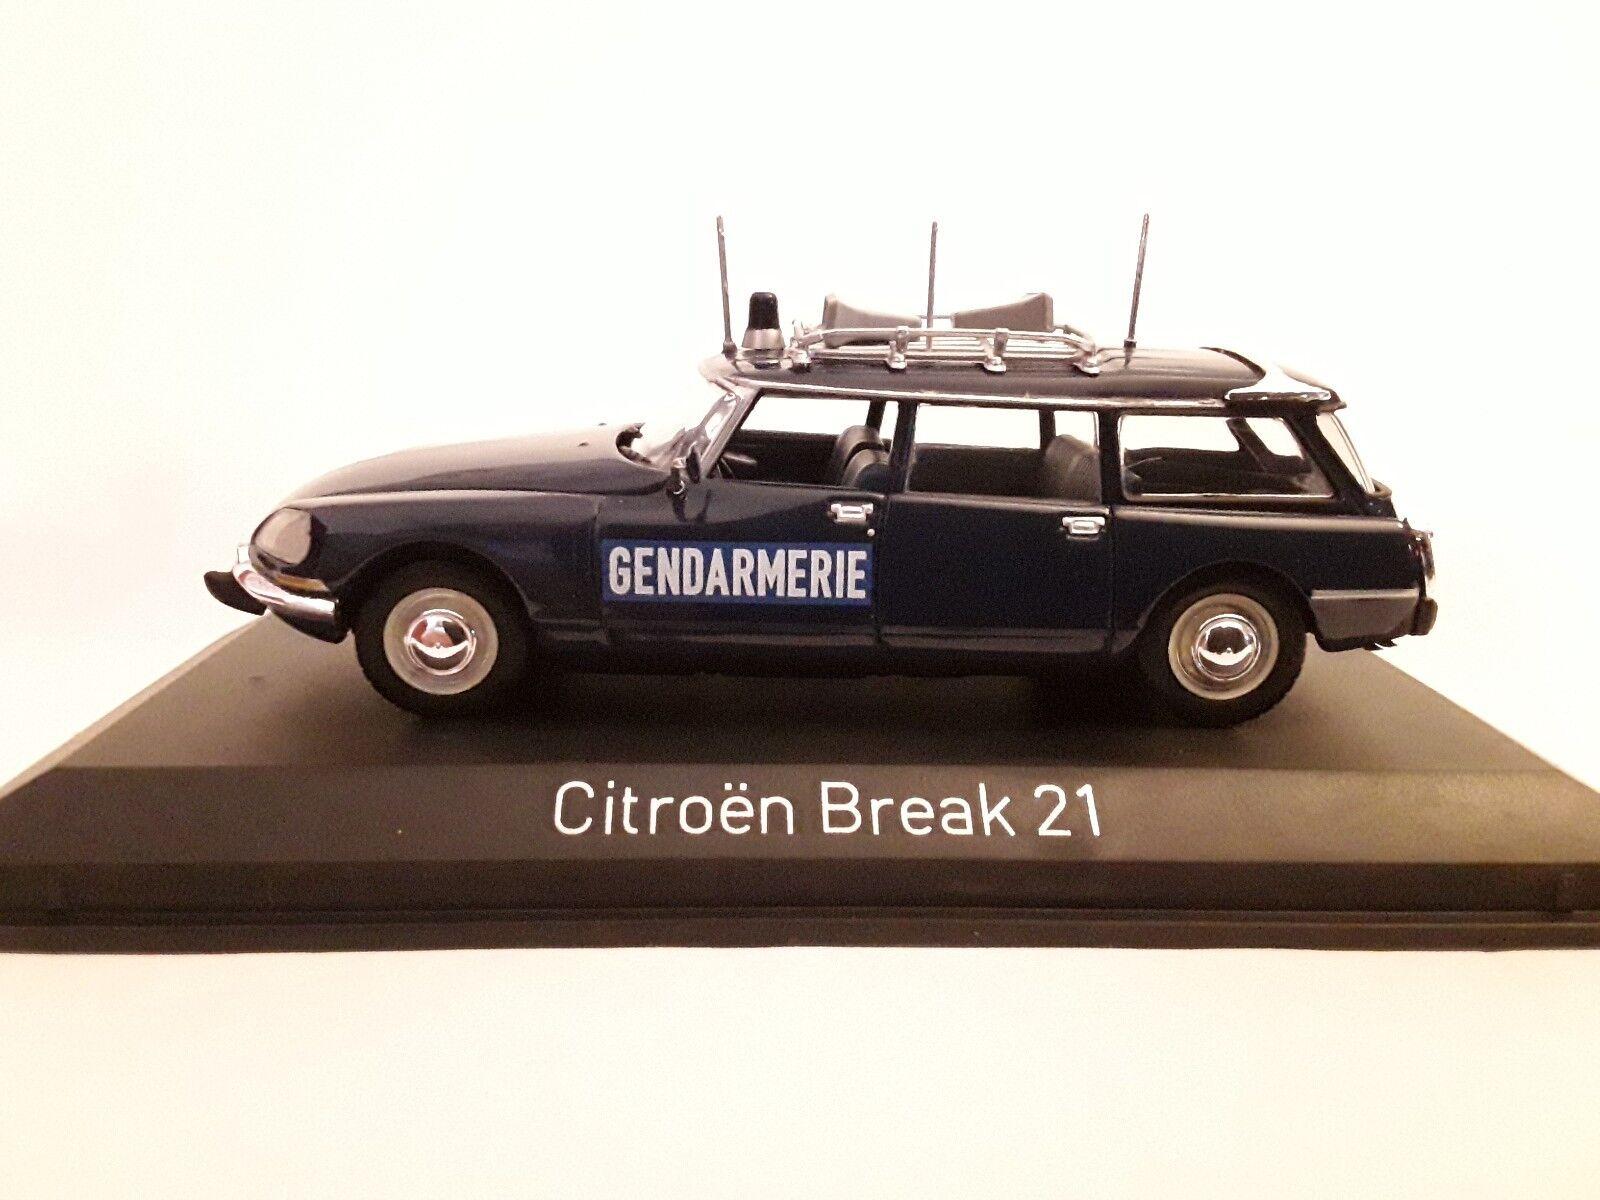 Citroen Break 21  Gendarmerie 1974  1 43 Norev 155043